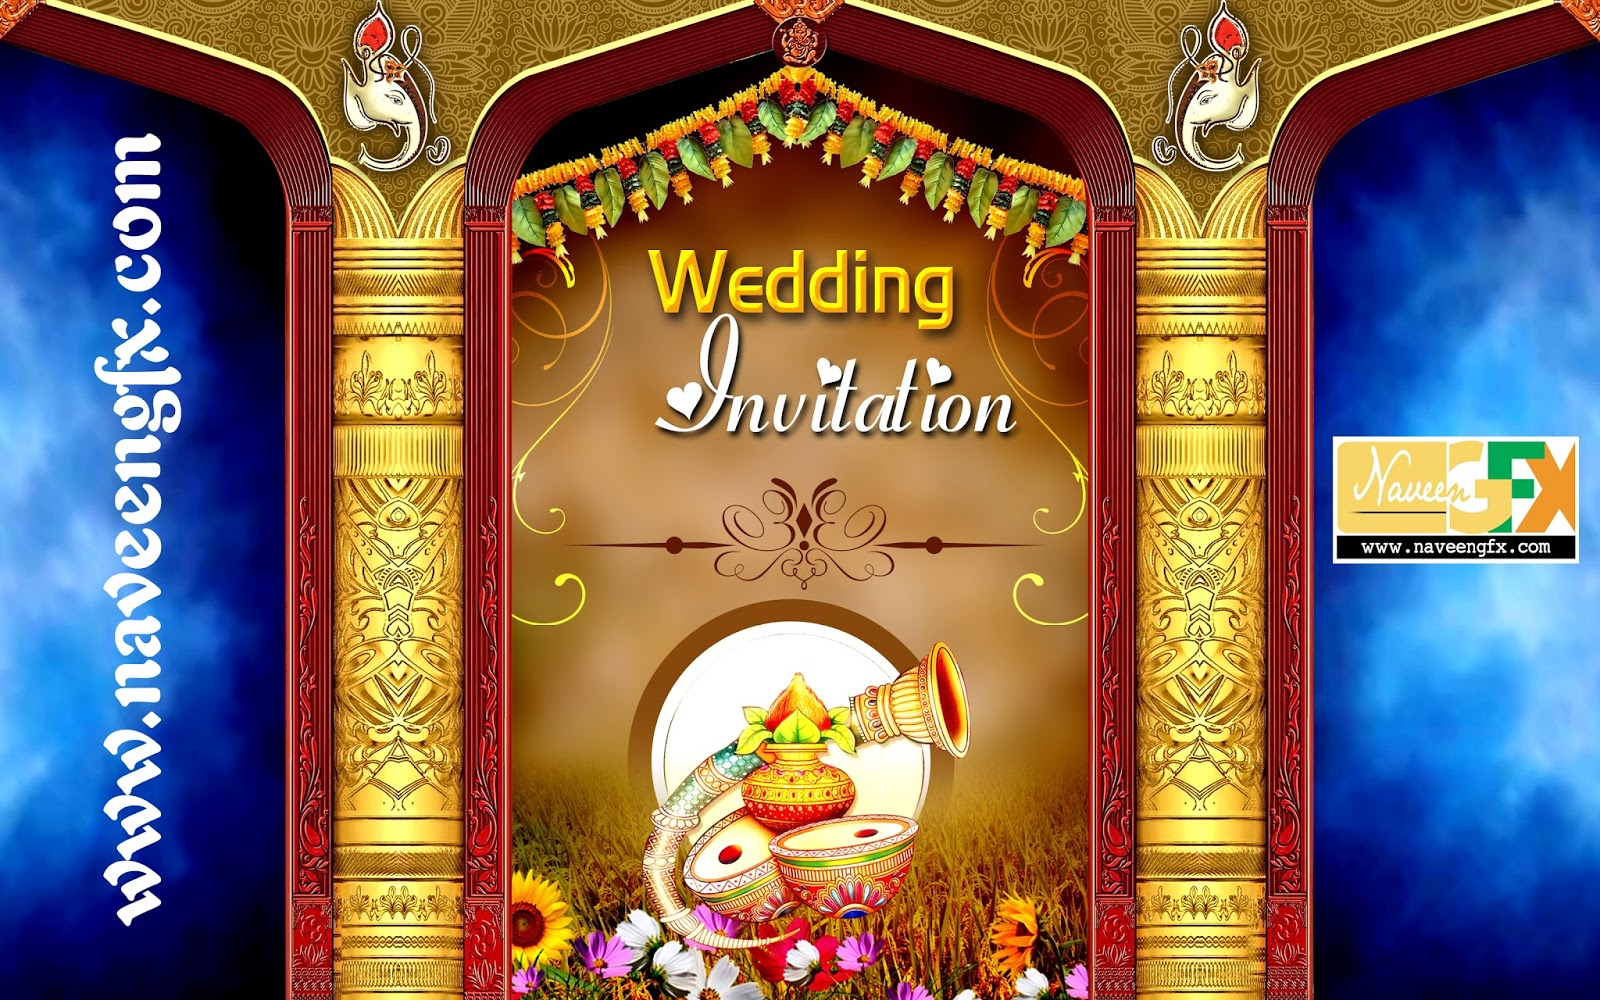 Design banner free download - Wedding Banner Design Templates Free Downloads